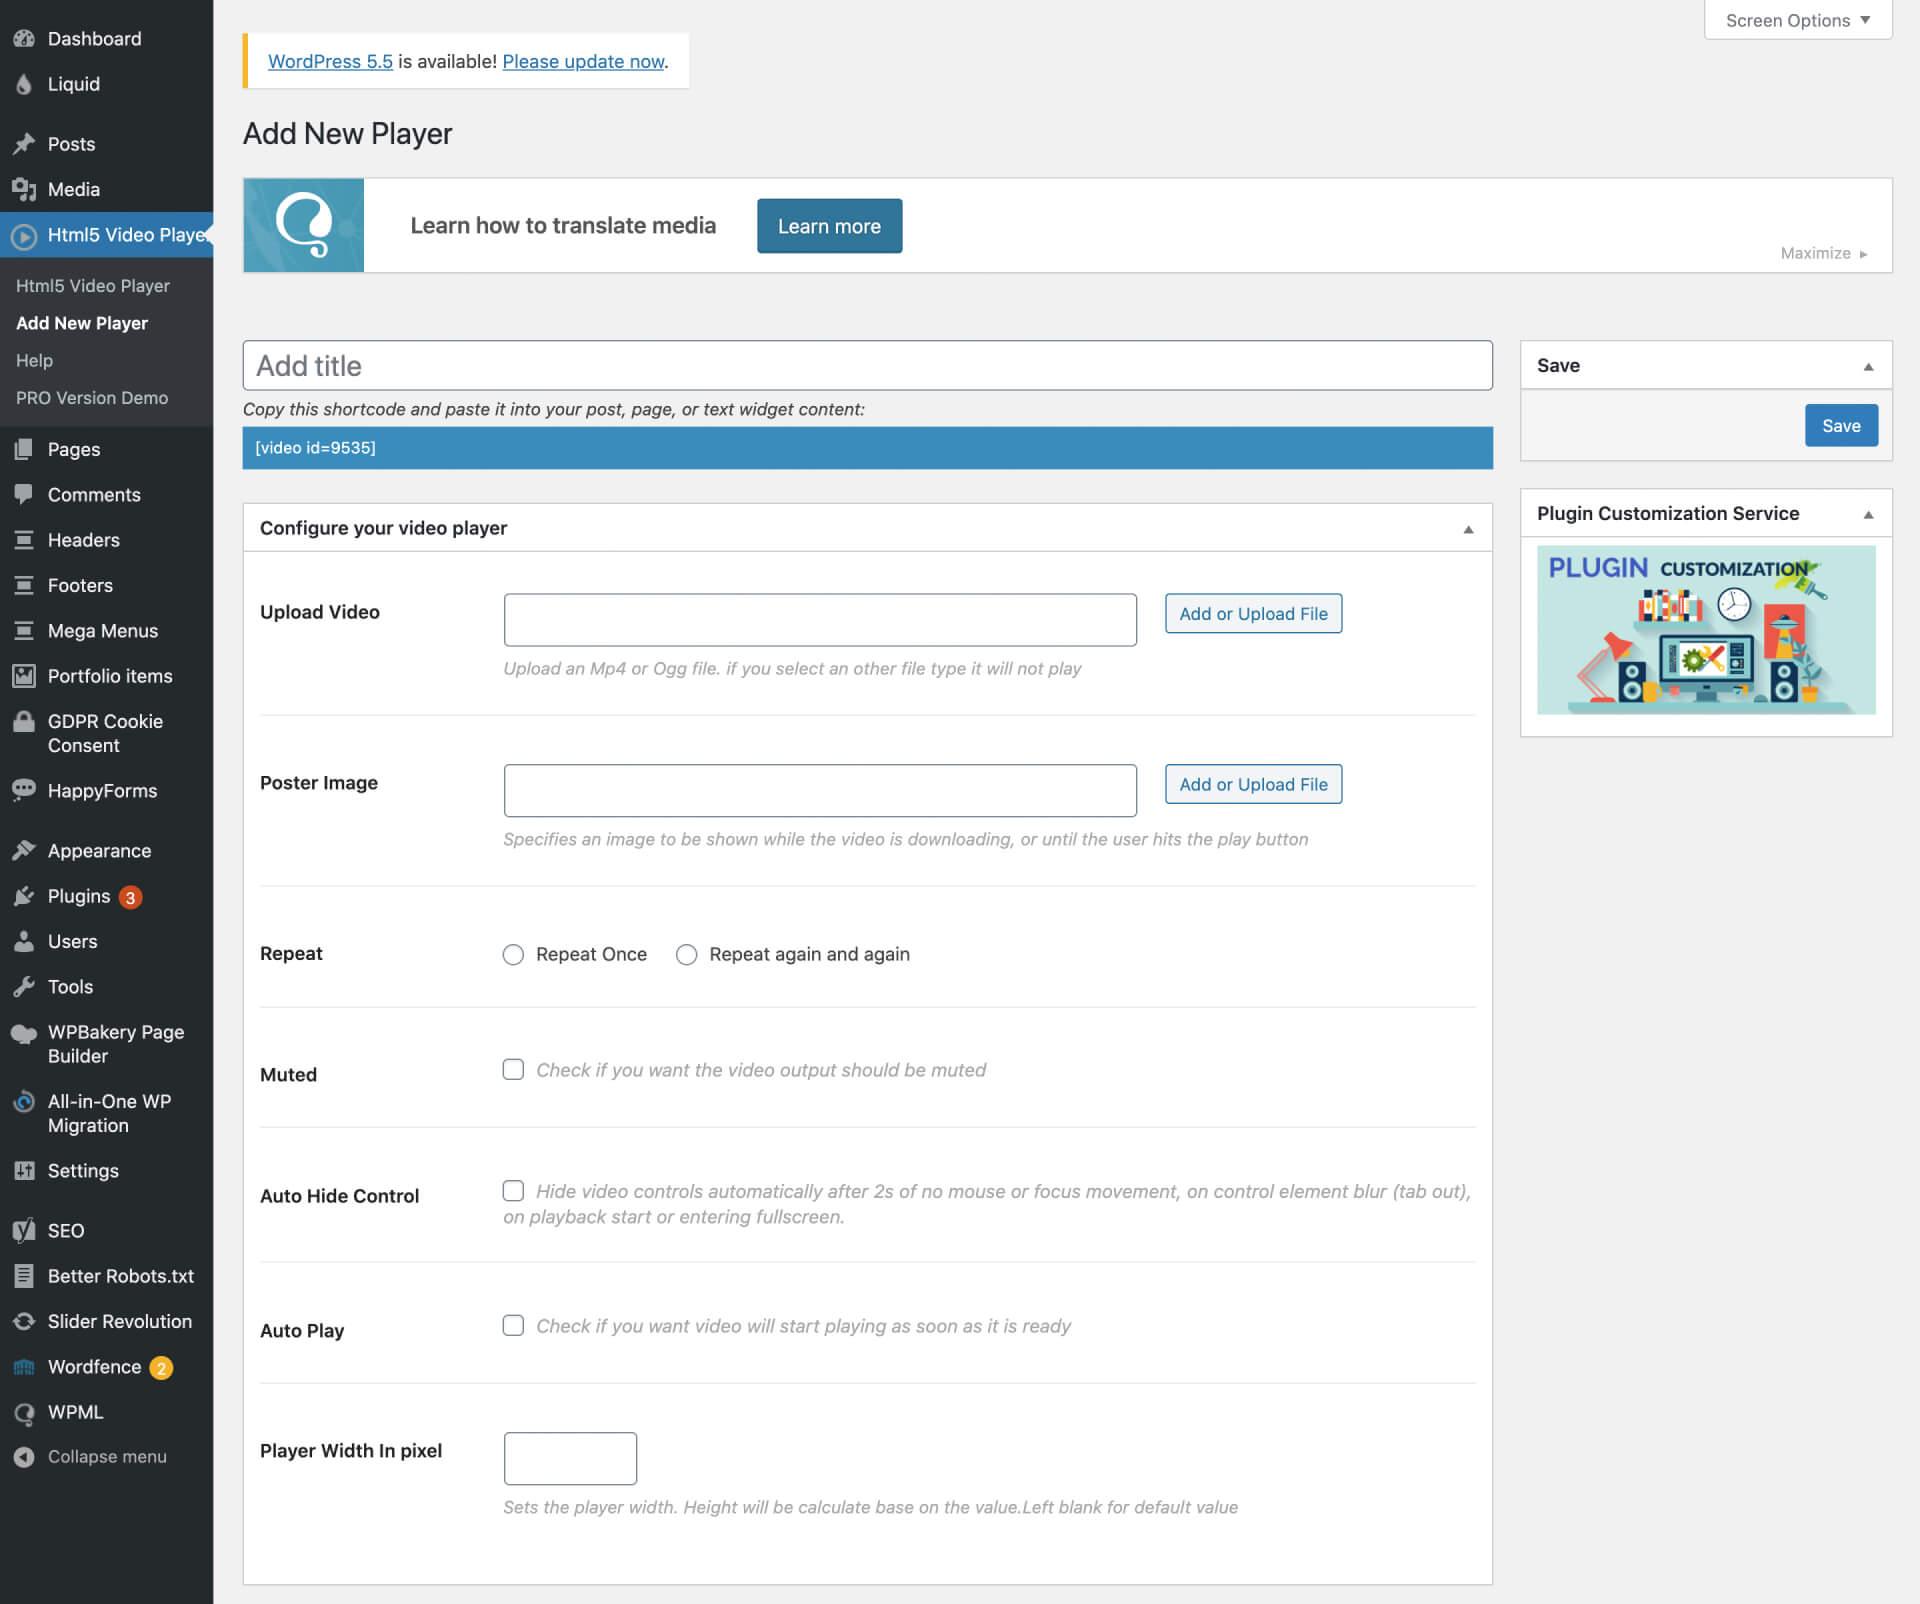 Html5 Video Player — mp4 player, Video Player for WordPress 外掛後台介面-IrvingLab 爾文實驗室